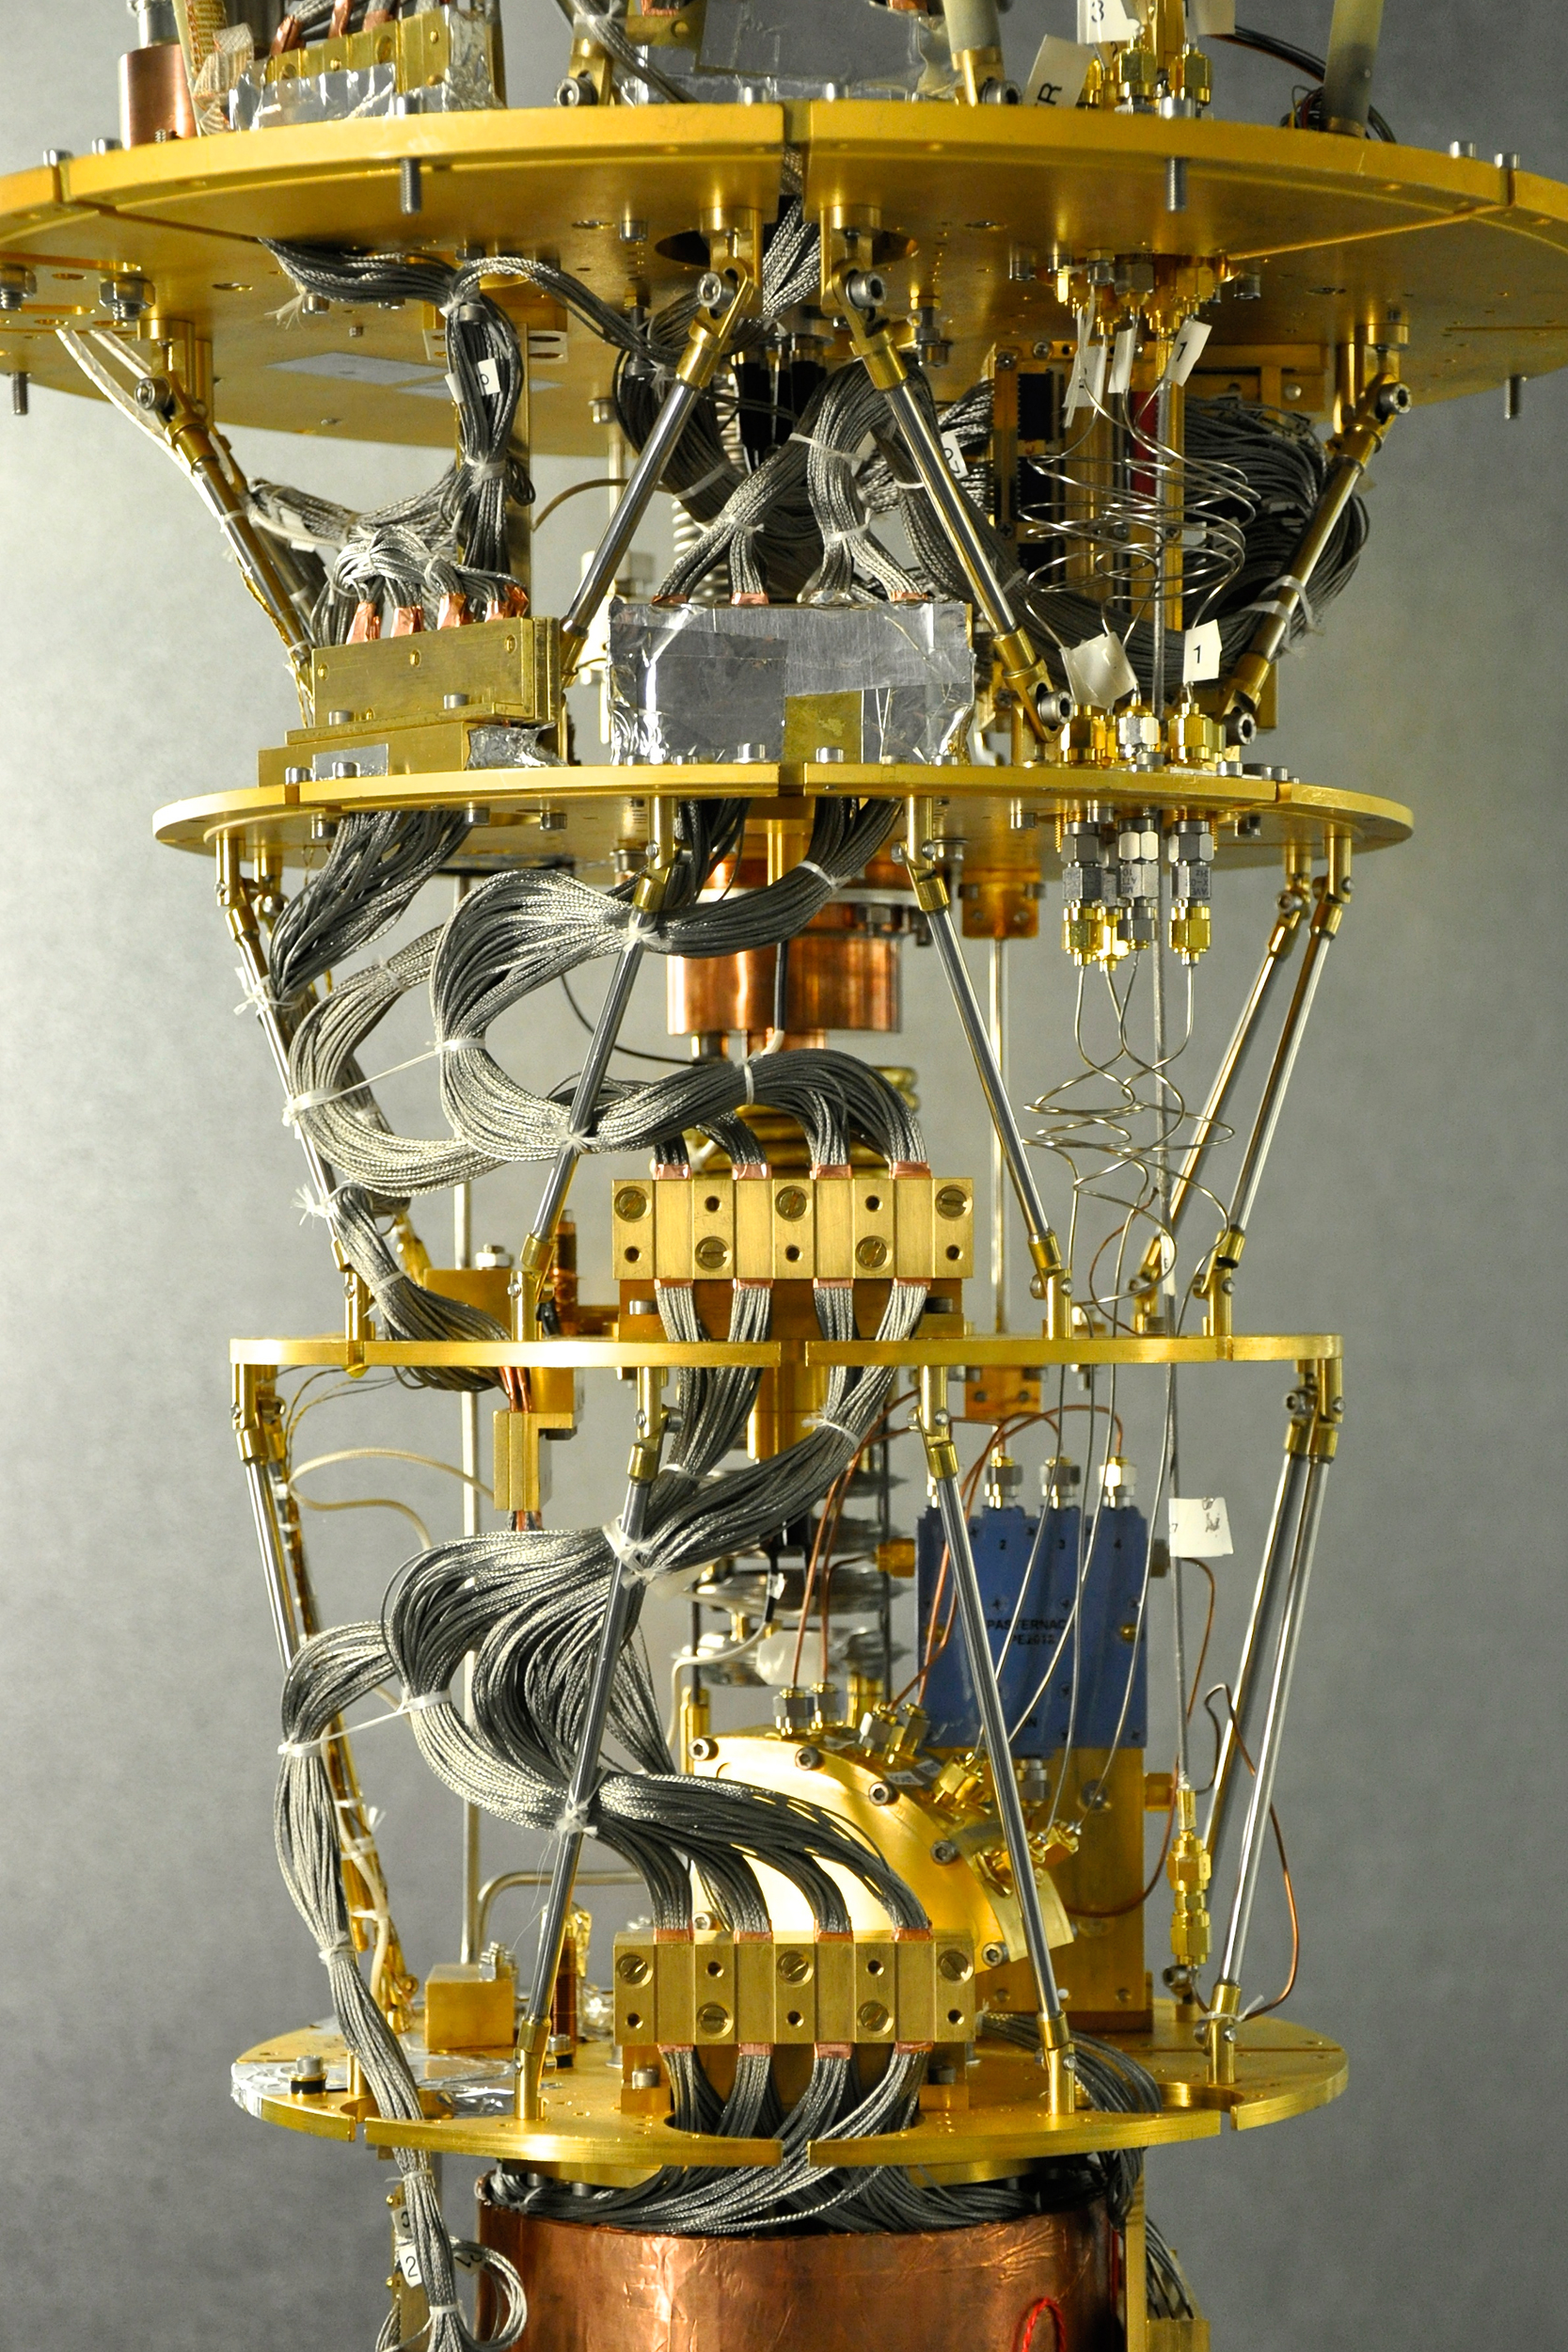 Quantum Computer Diagram From A Quantum Computer To